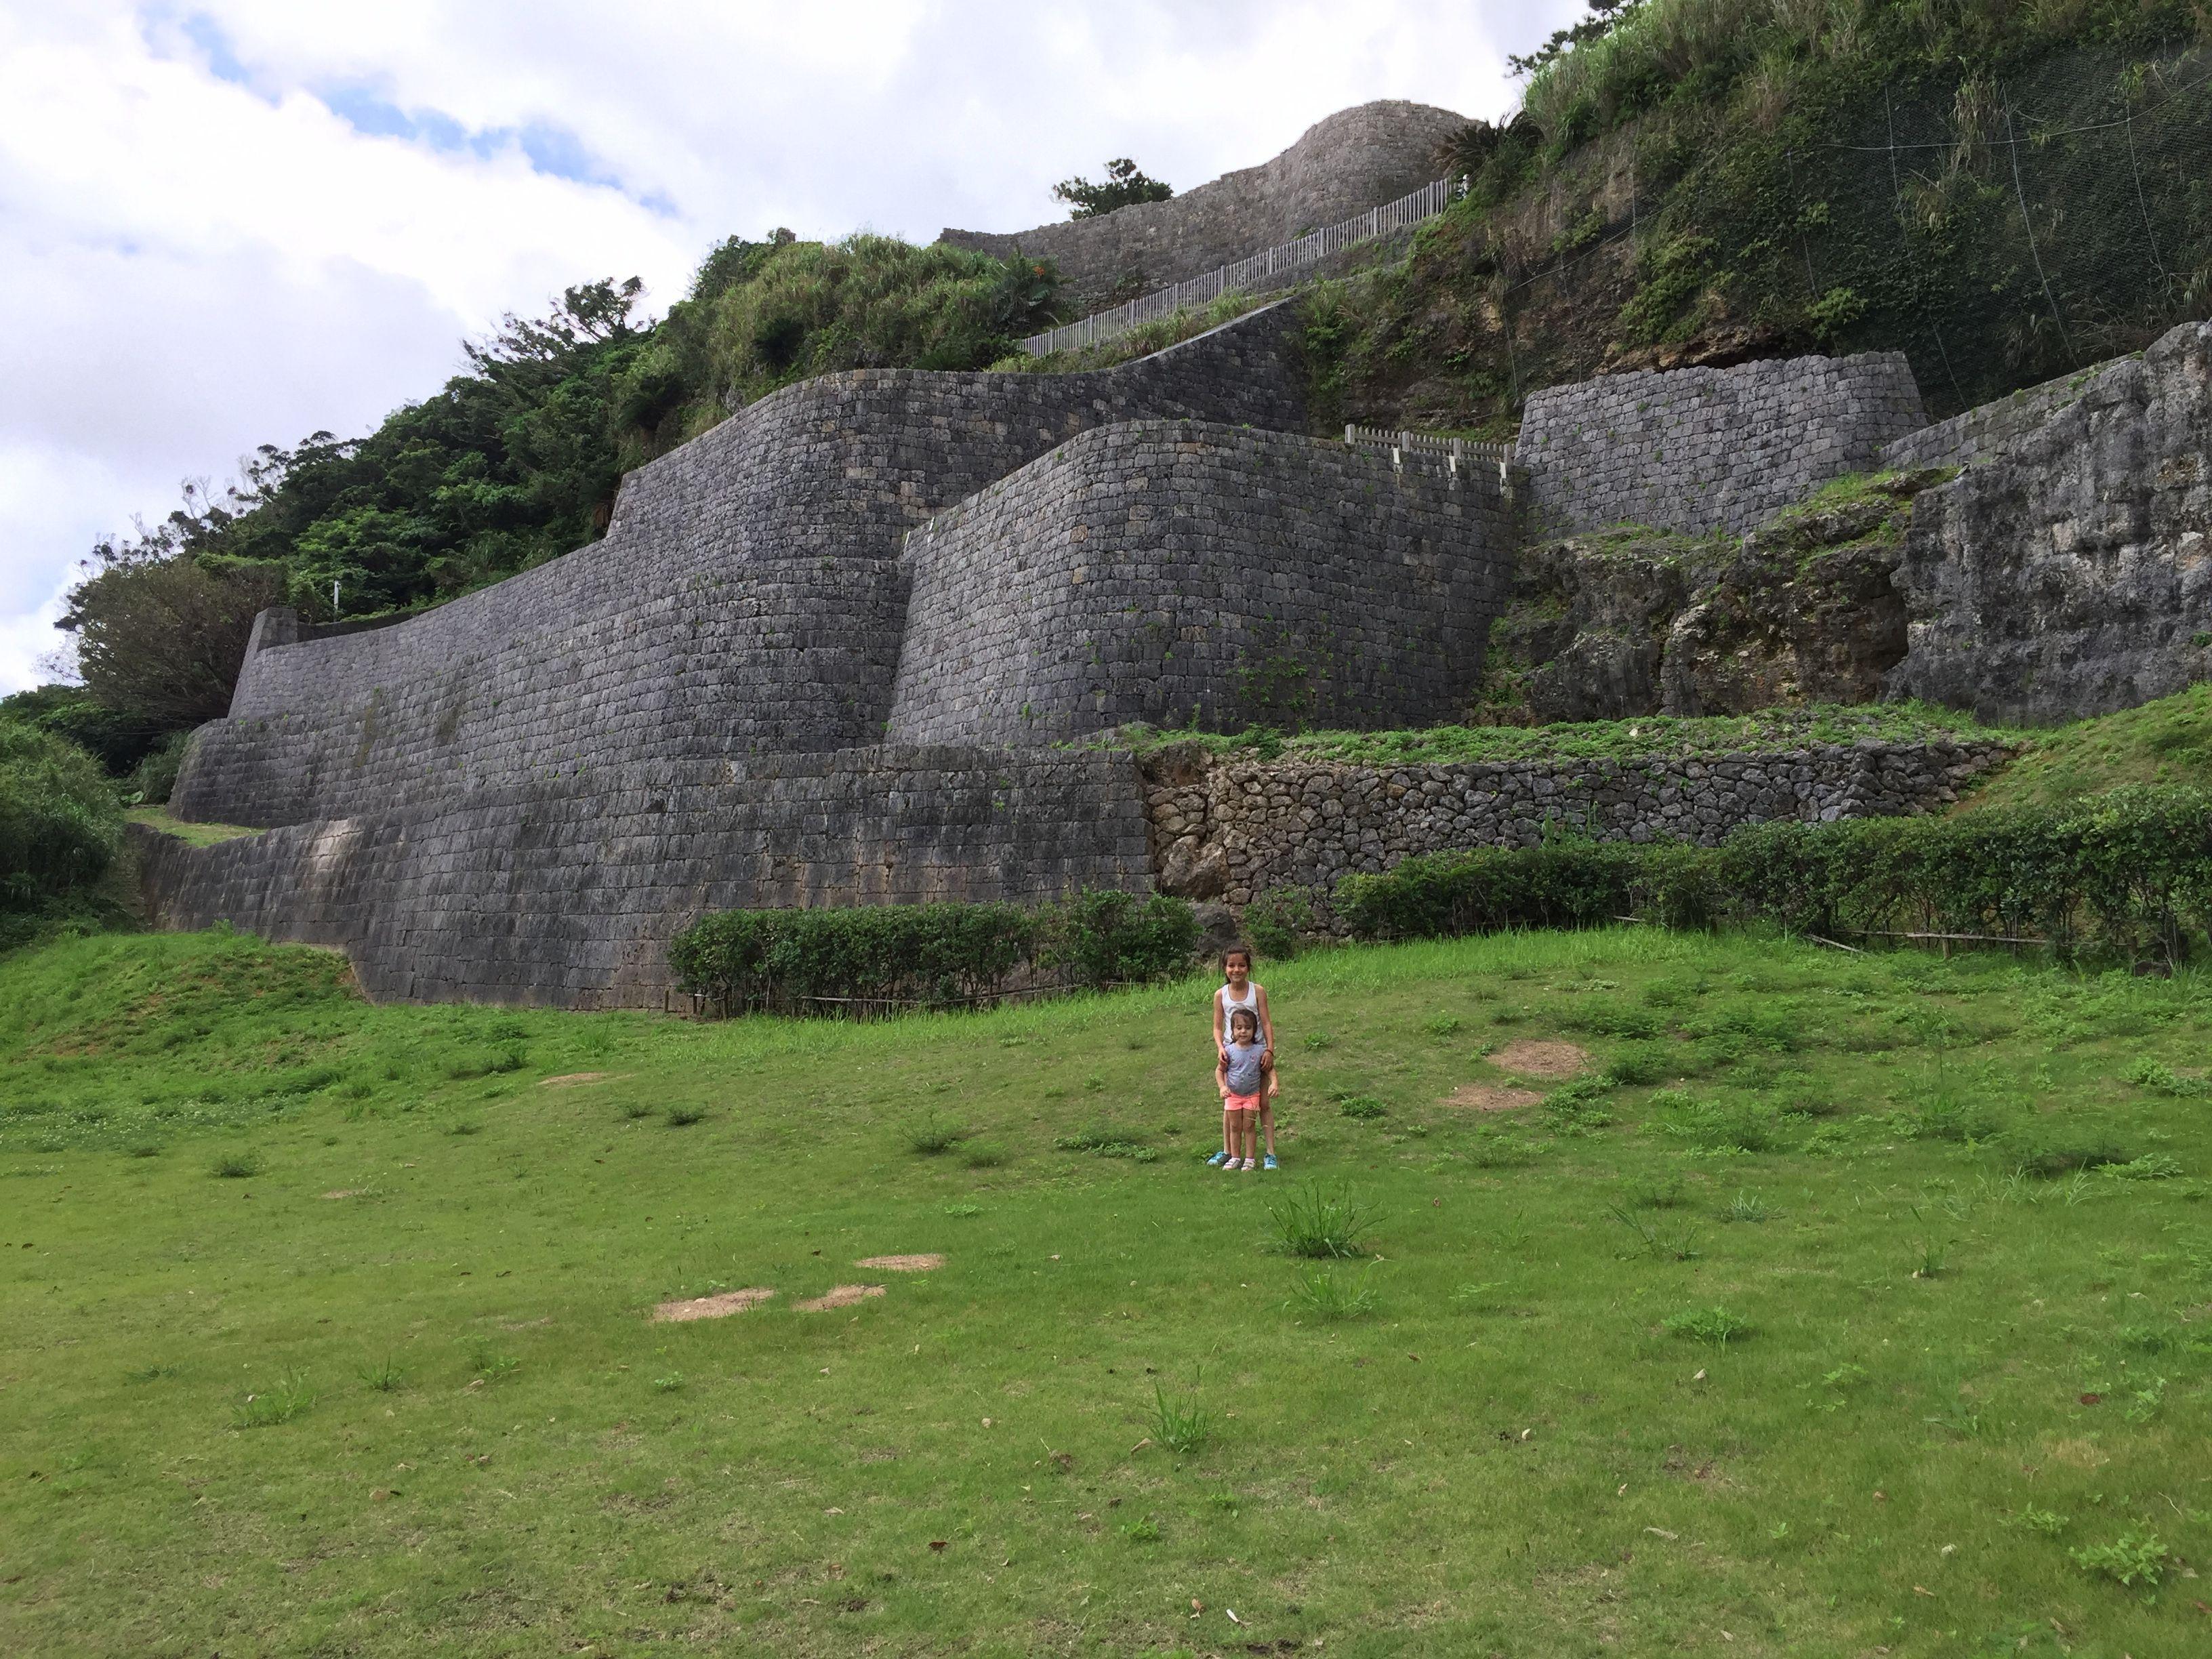 Nakadomari Ruins - Okinawa, Japan | AllTrails |Okinawa Japan Ruins